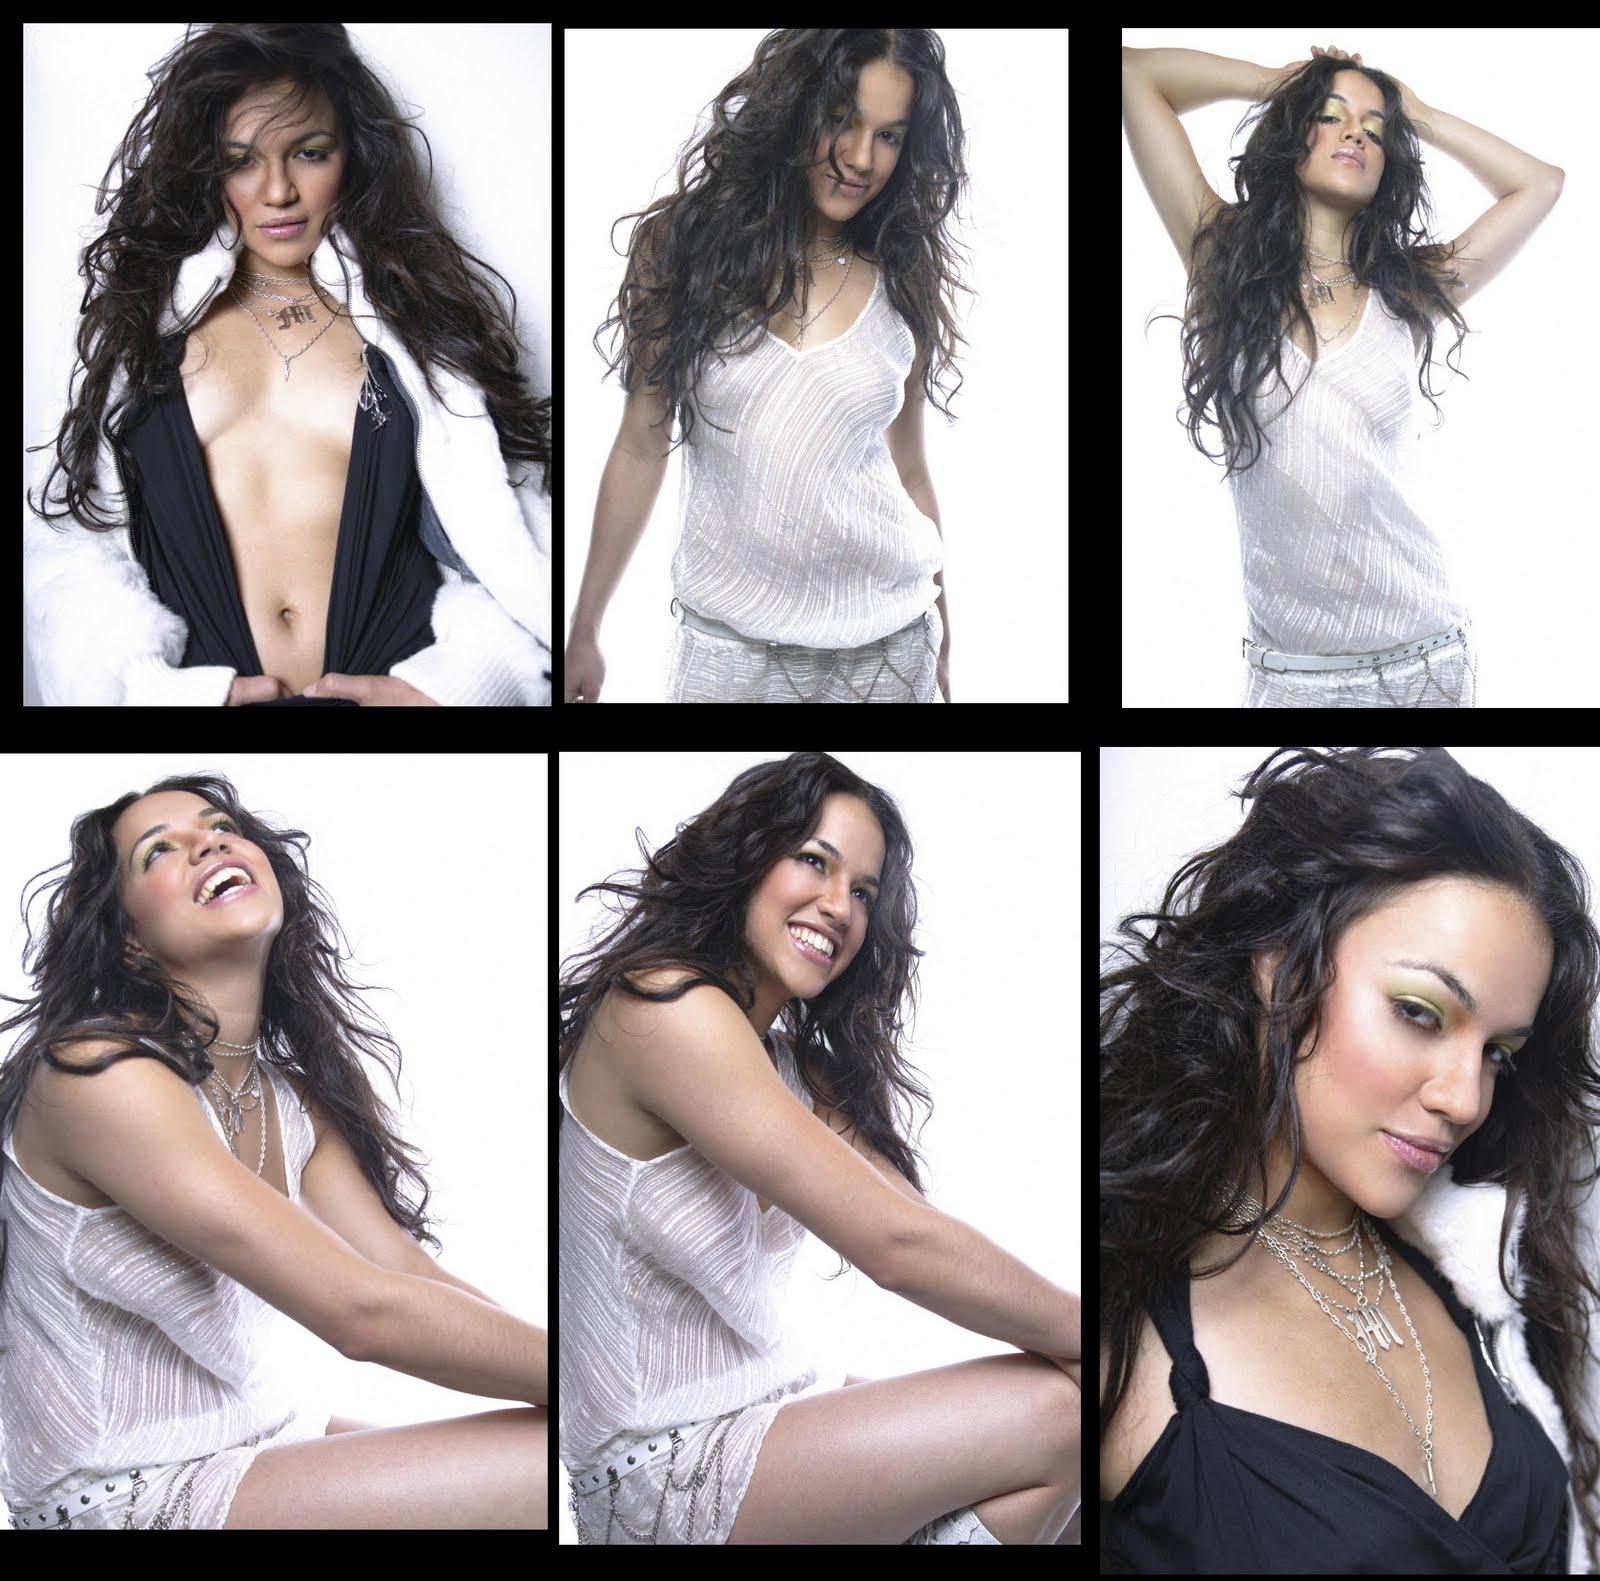 http://2.bp.blogspot.com/-PgSNEnamKno/TcAMCxQKBJI/AAAAAAAAADM/m2OE1JQDgVg/s1600/Michelle+Rodriguez1111.jpg